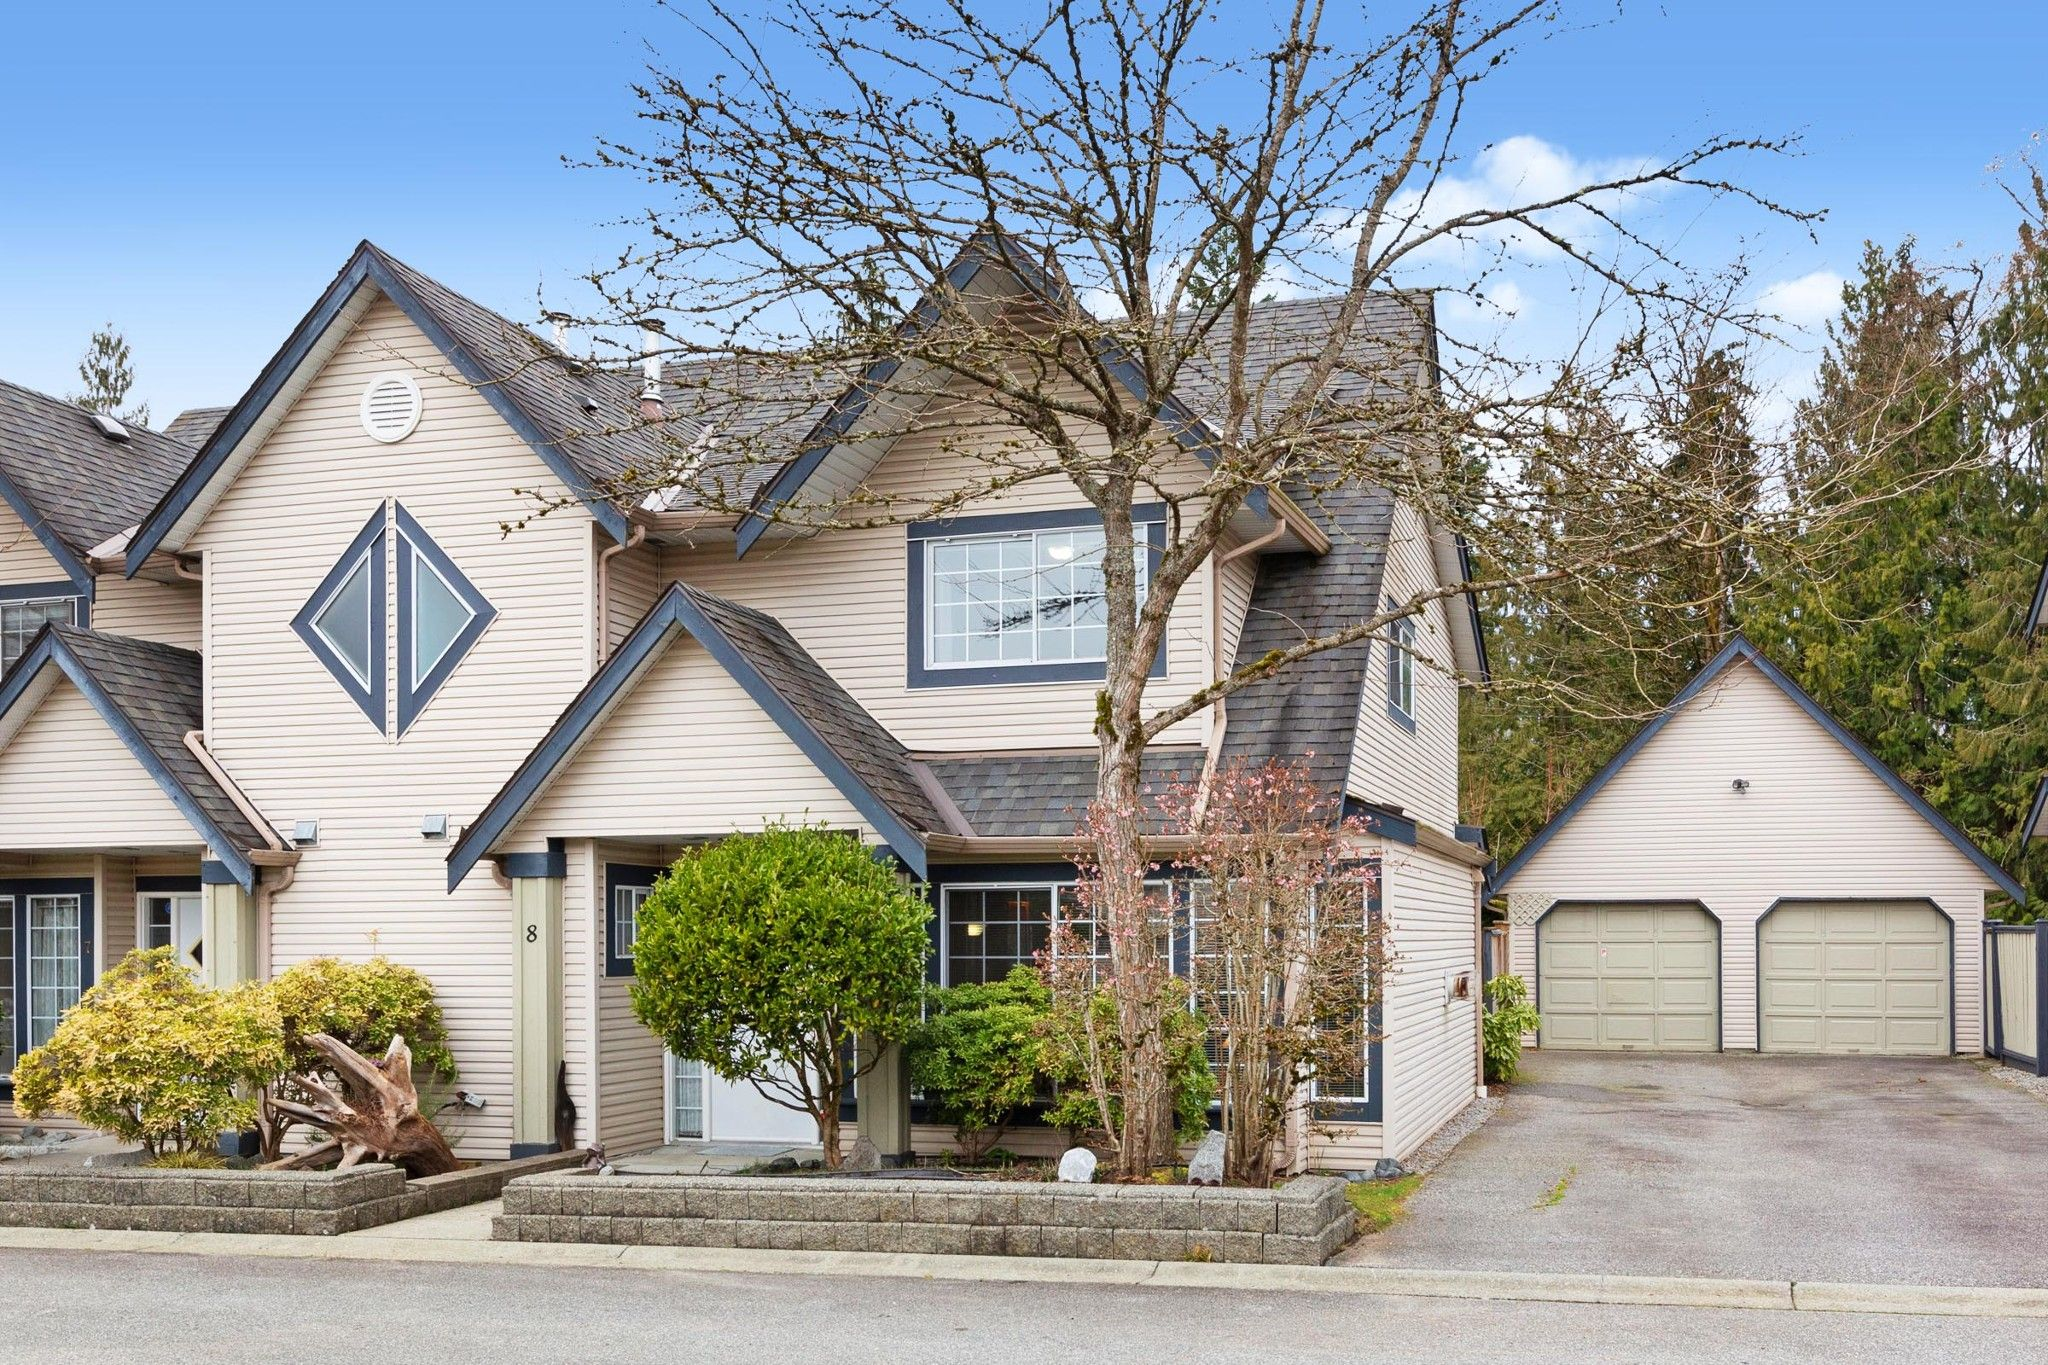 Main Photo: 8 11536 236 Street in Maple Ridge: Cottonwood MR Townhouse for sale : MLS®# R2555572